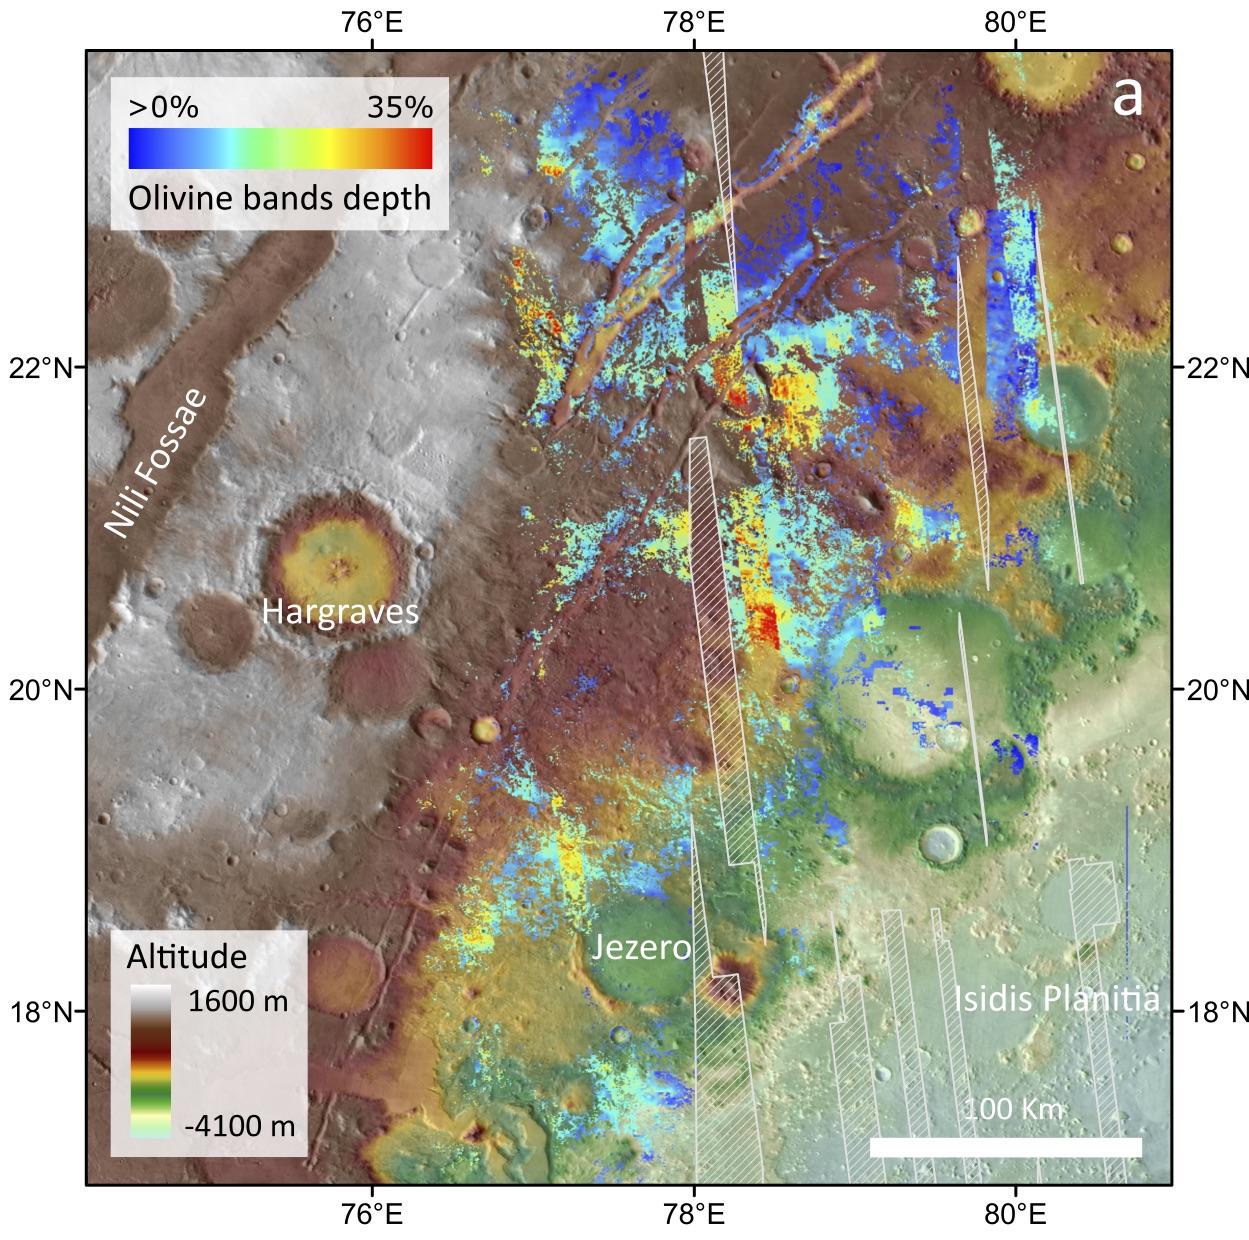 Jezero_crater_olivine_map.jpg